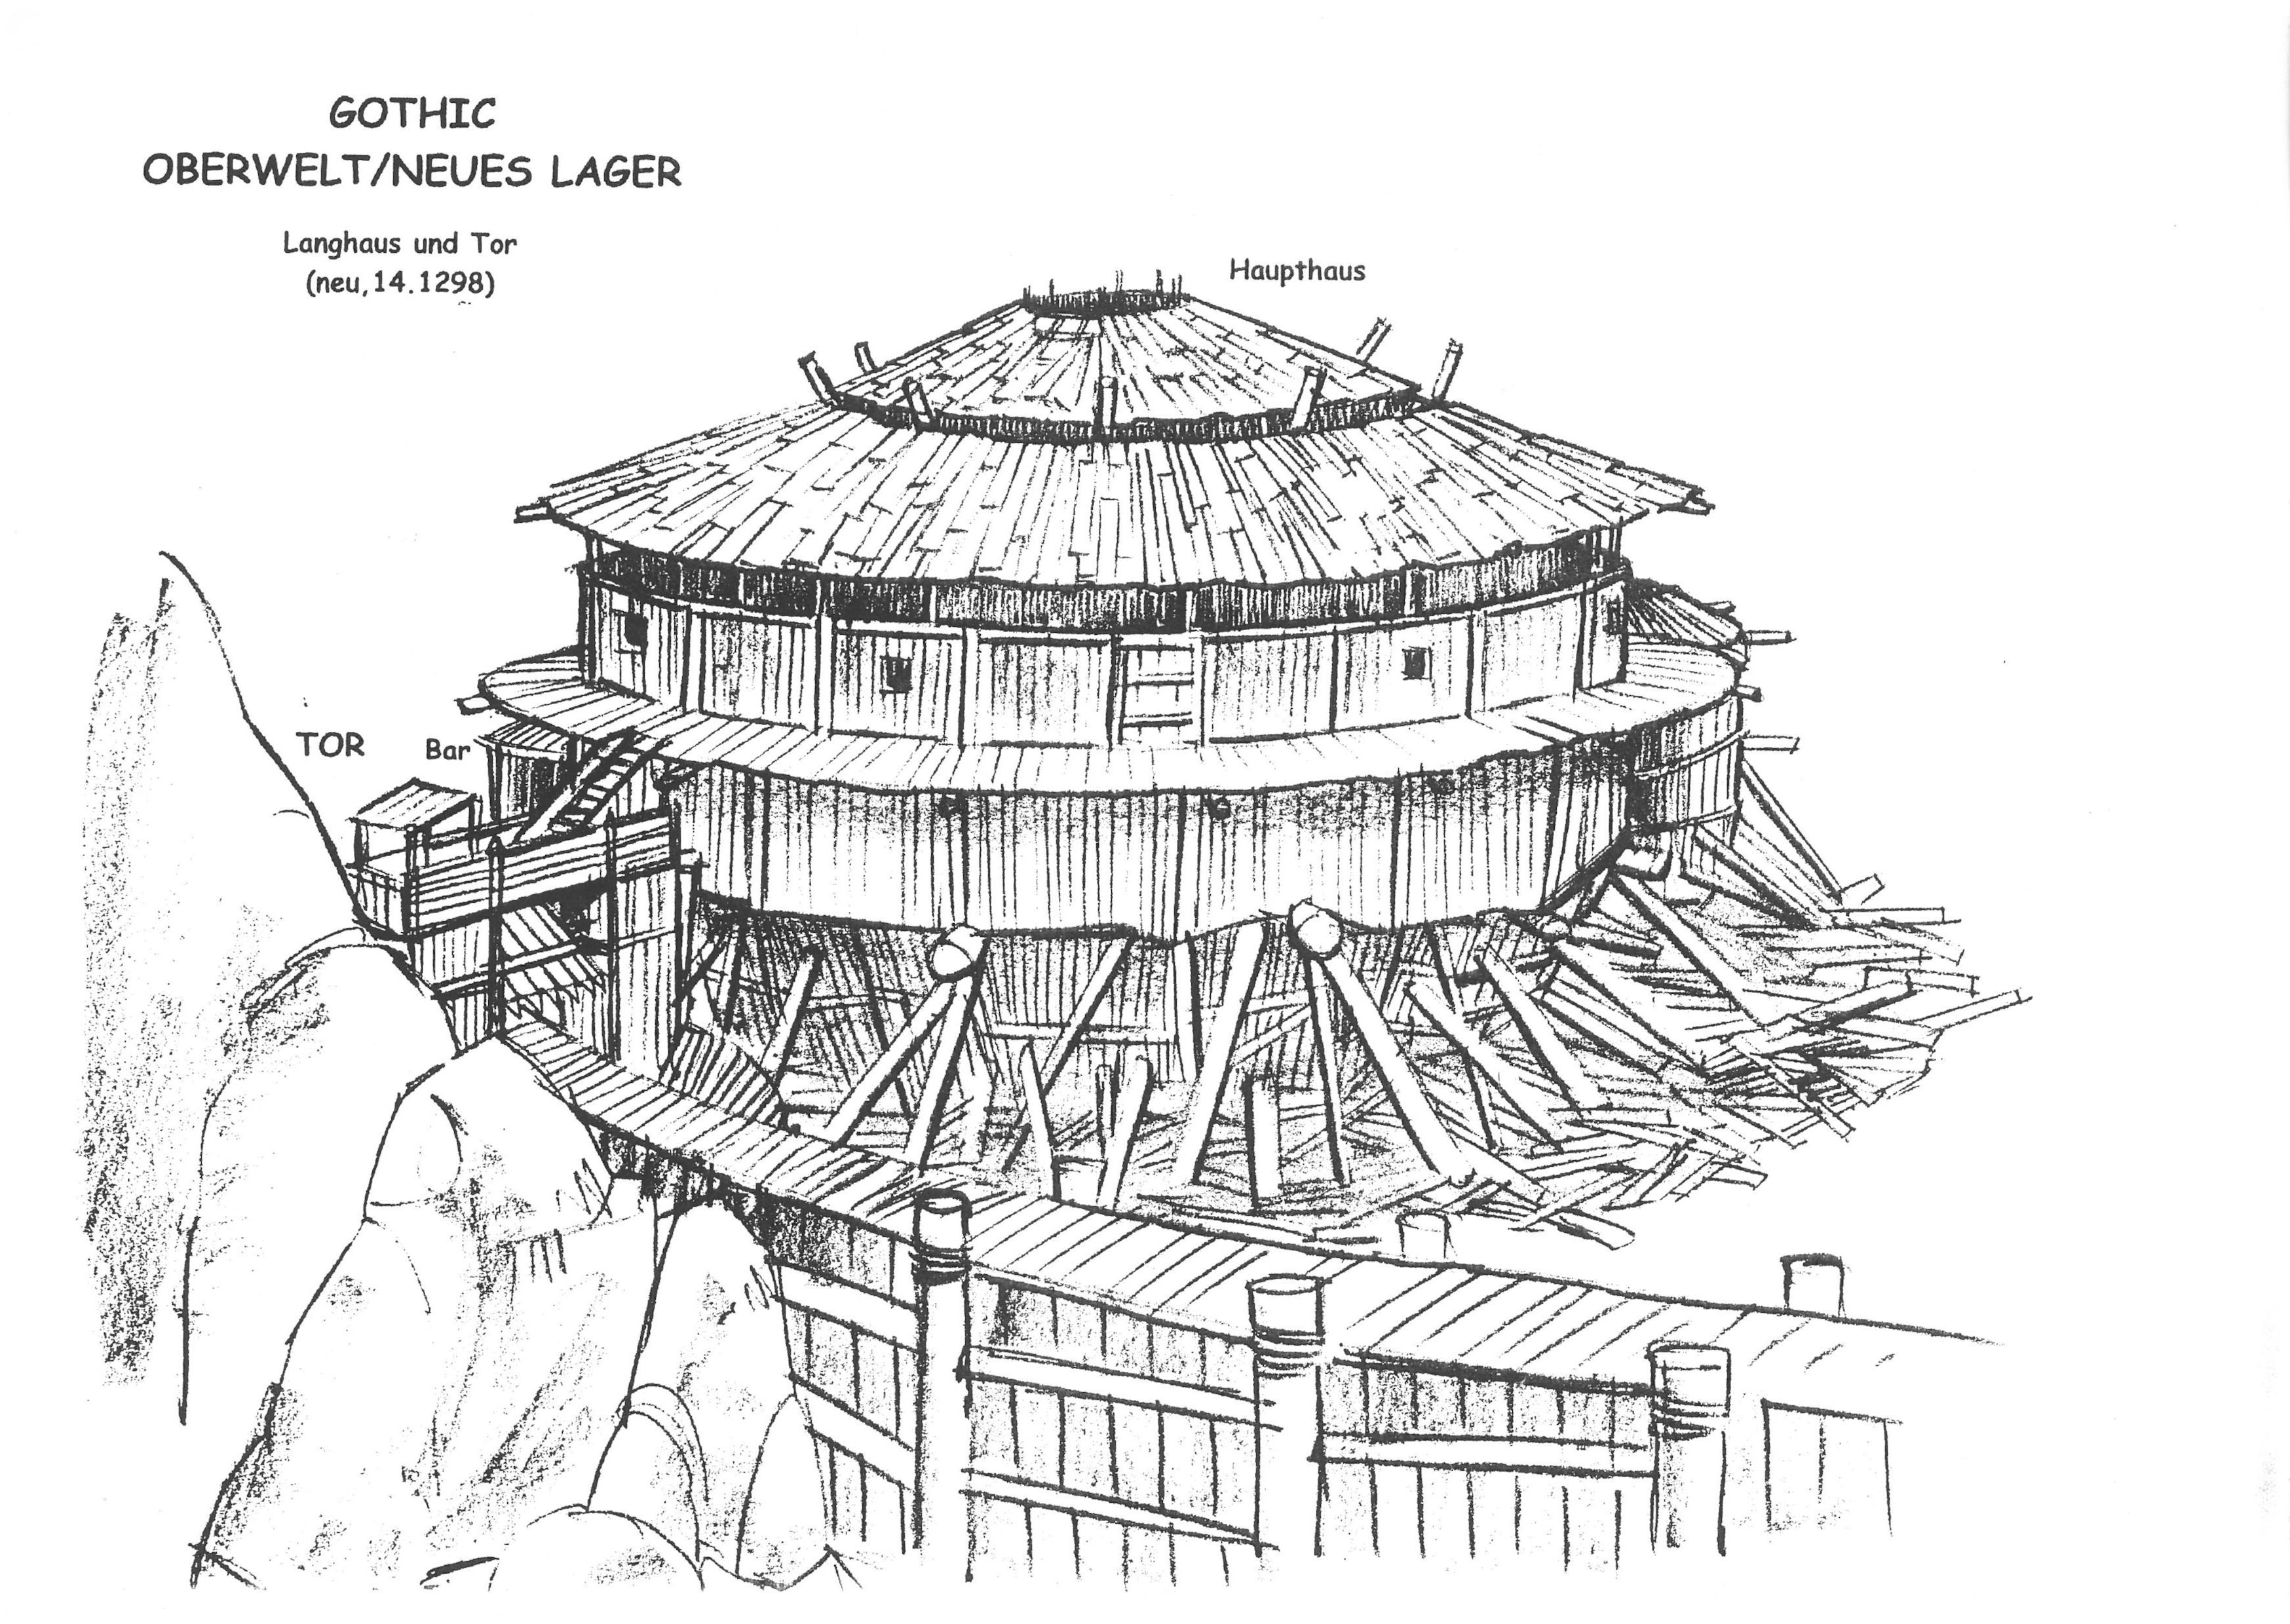 Neues Lager - Langhaus V2 und Tor